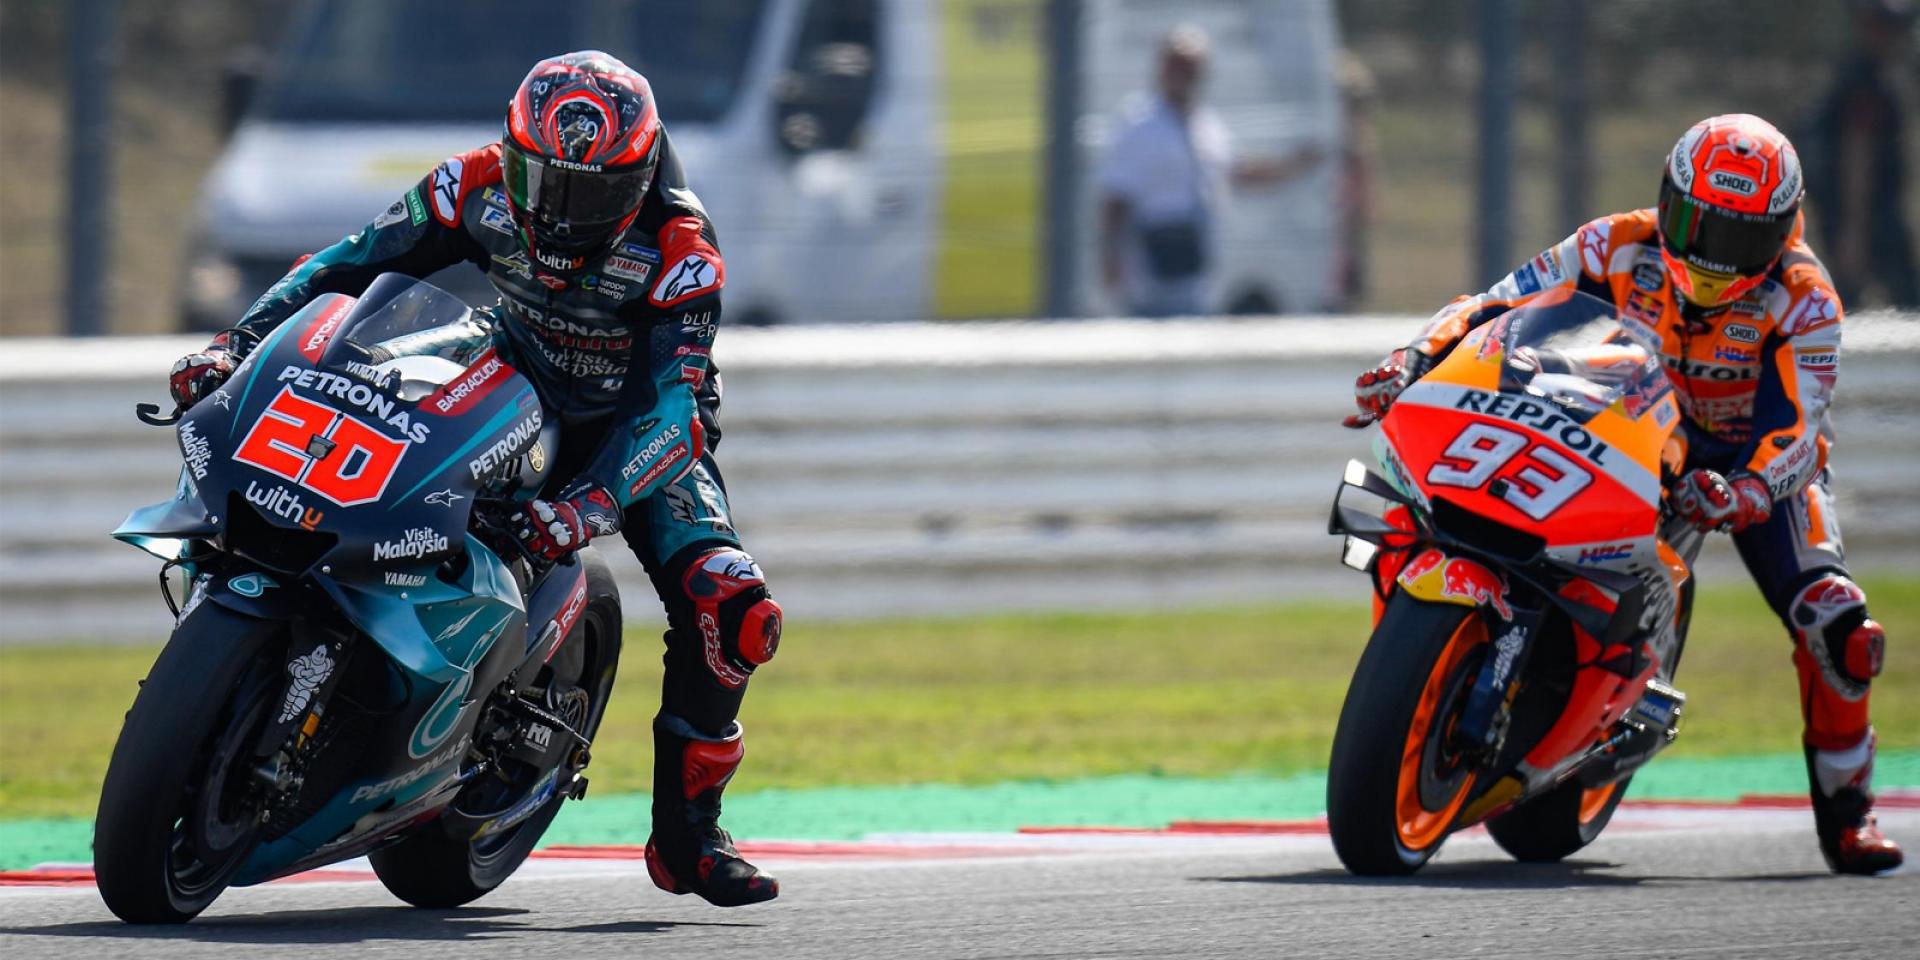 MotoGP賽道講堂|煞車技術的頂尖對決!Marquez與Quartararo的Misano對決分析。